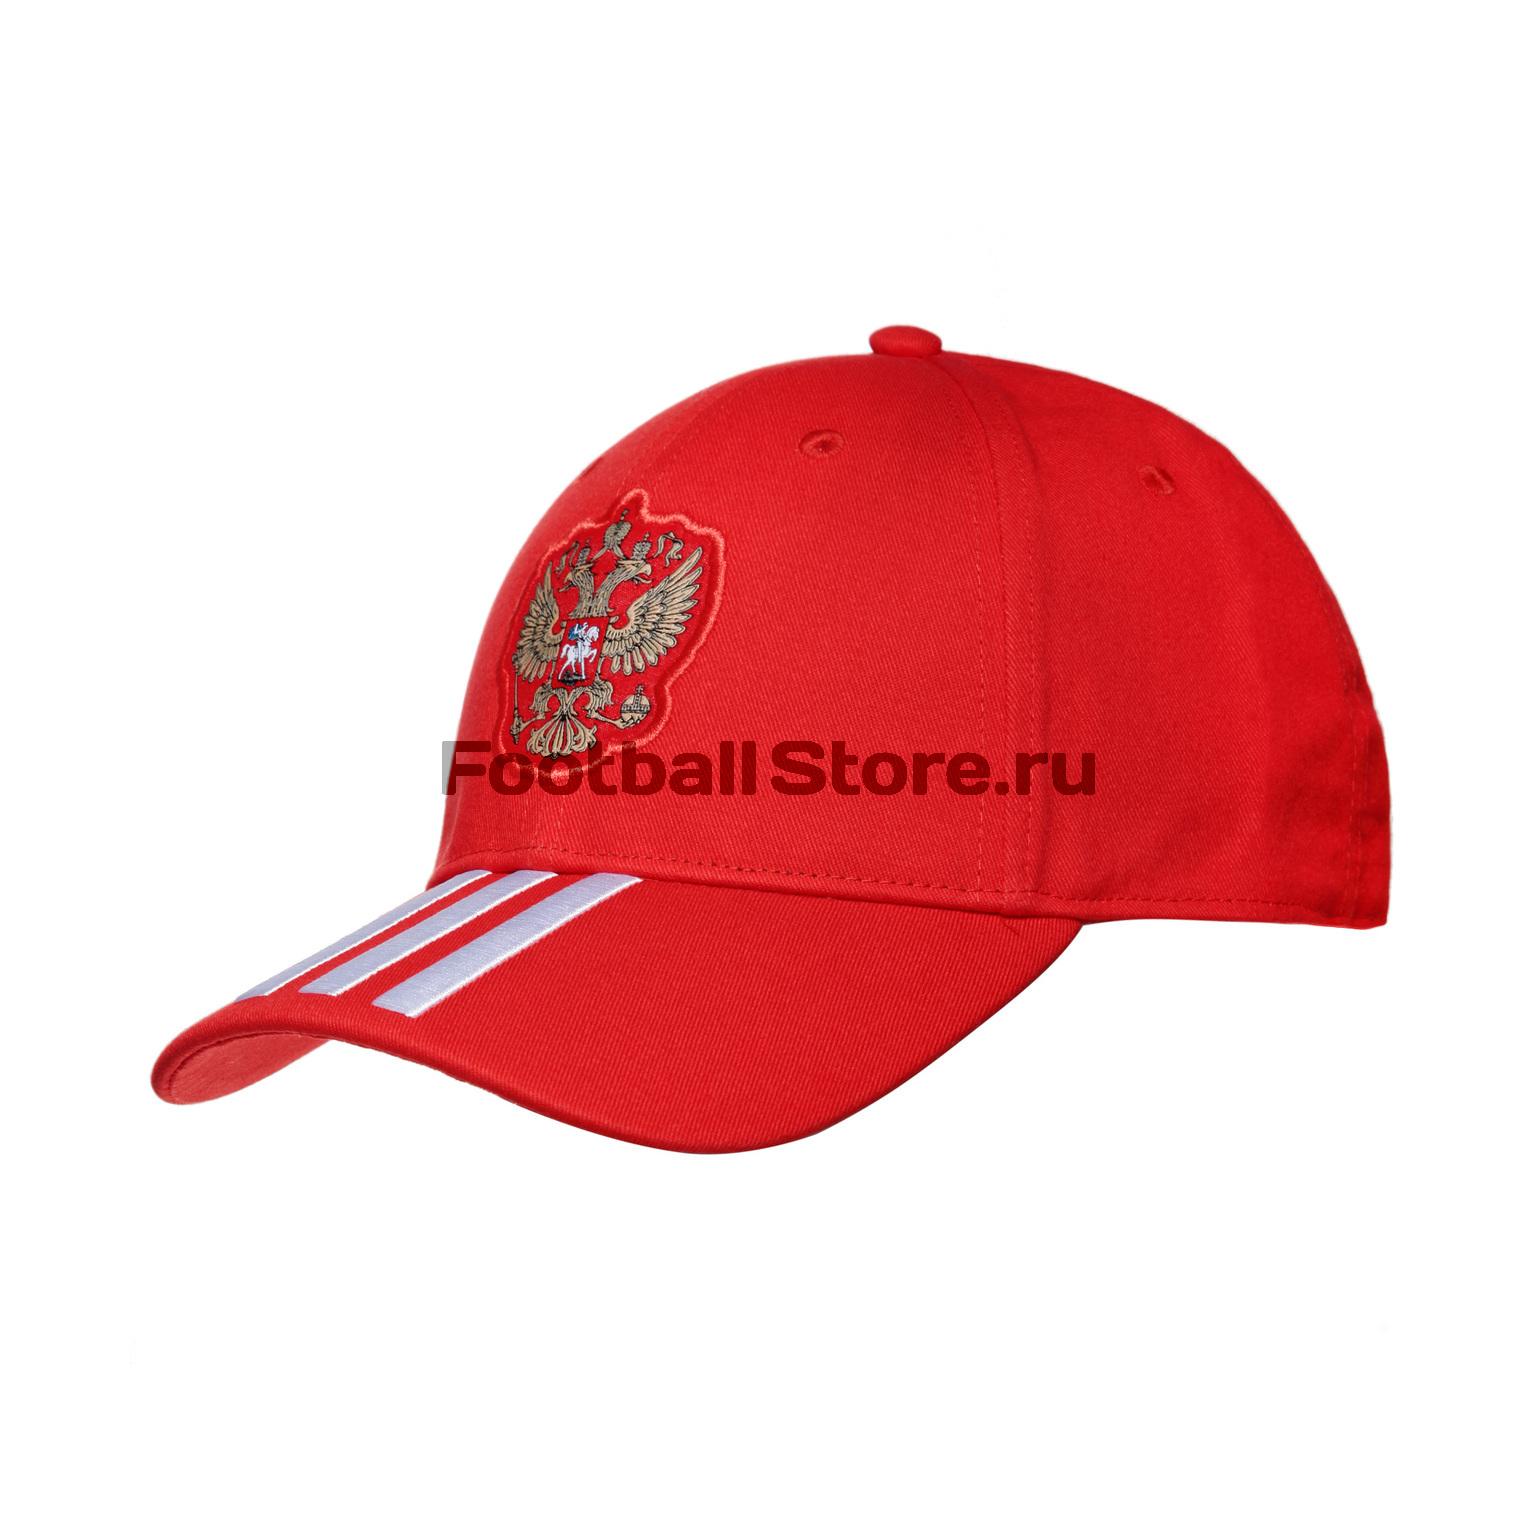 Бейсболка Adidas Russia 3S Cap CF4973 adidas adidas russia 3 stripes cap